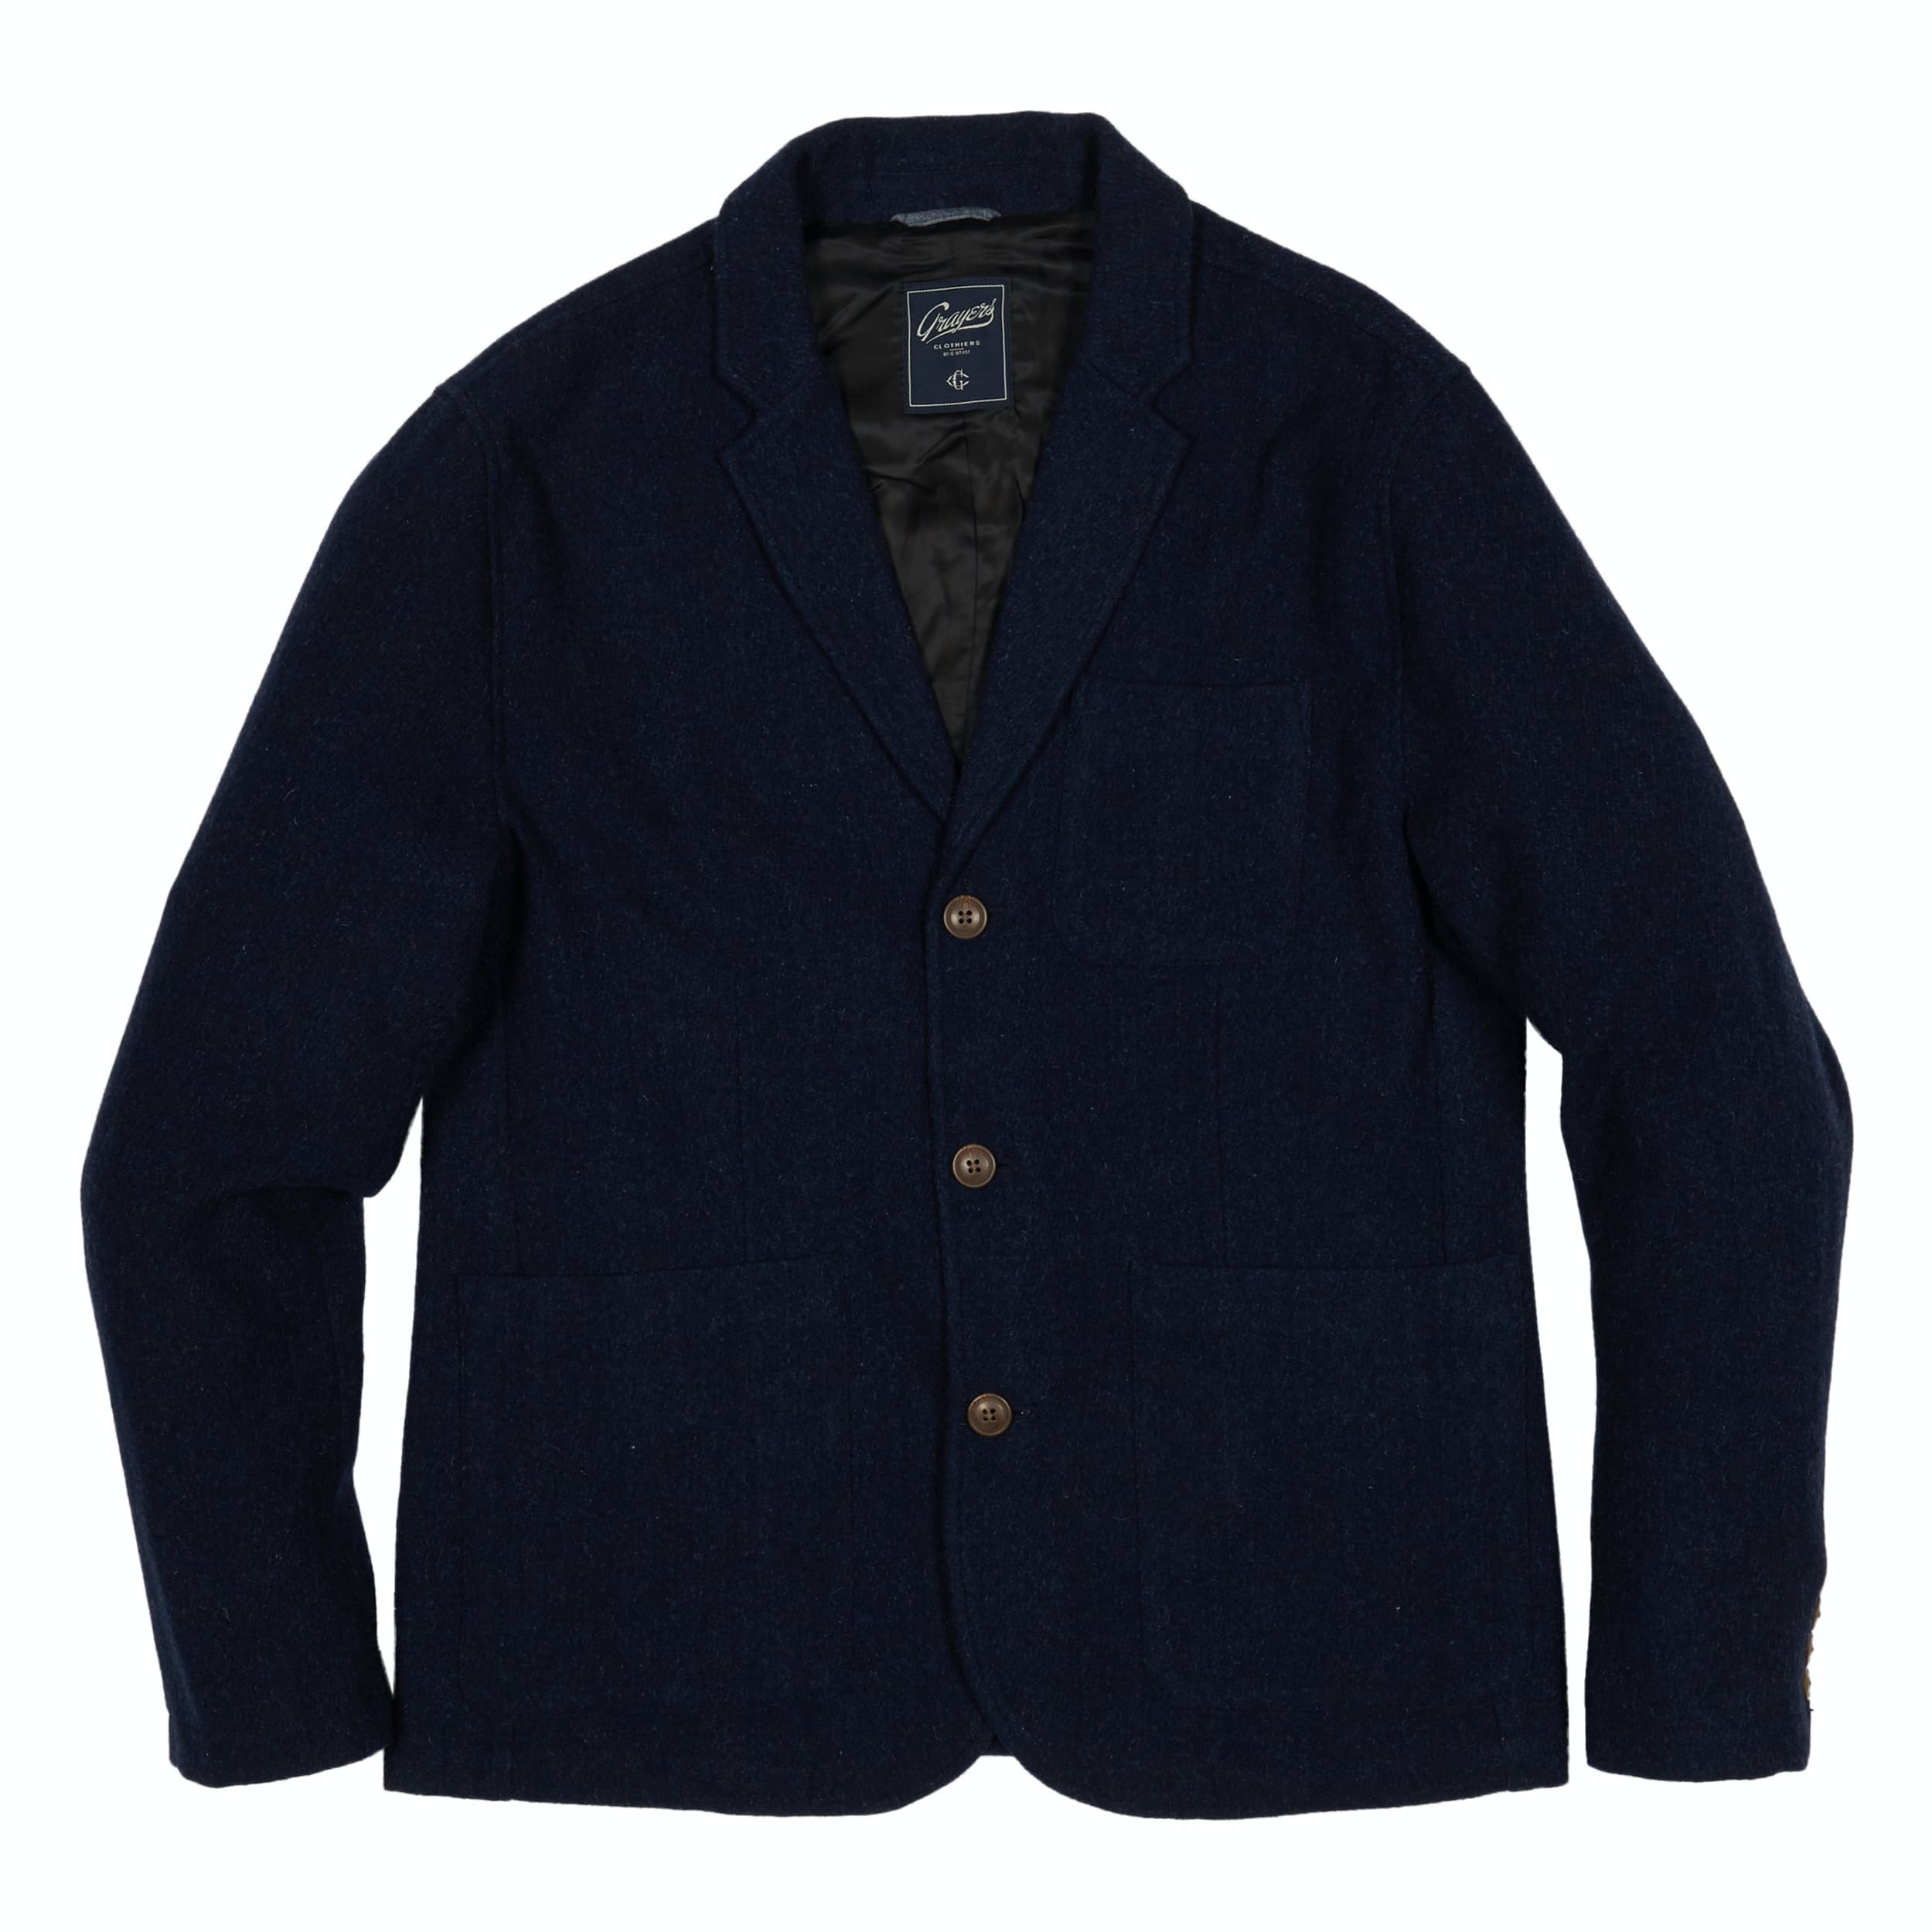 Vvcaacdsa6 grayers hutton wool sport coat 0 original